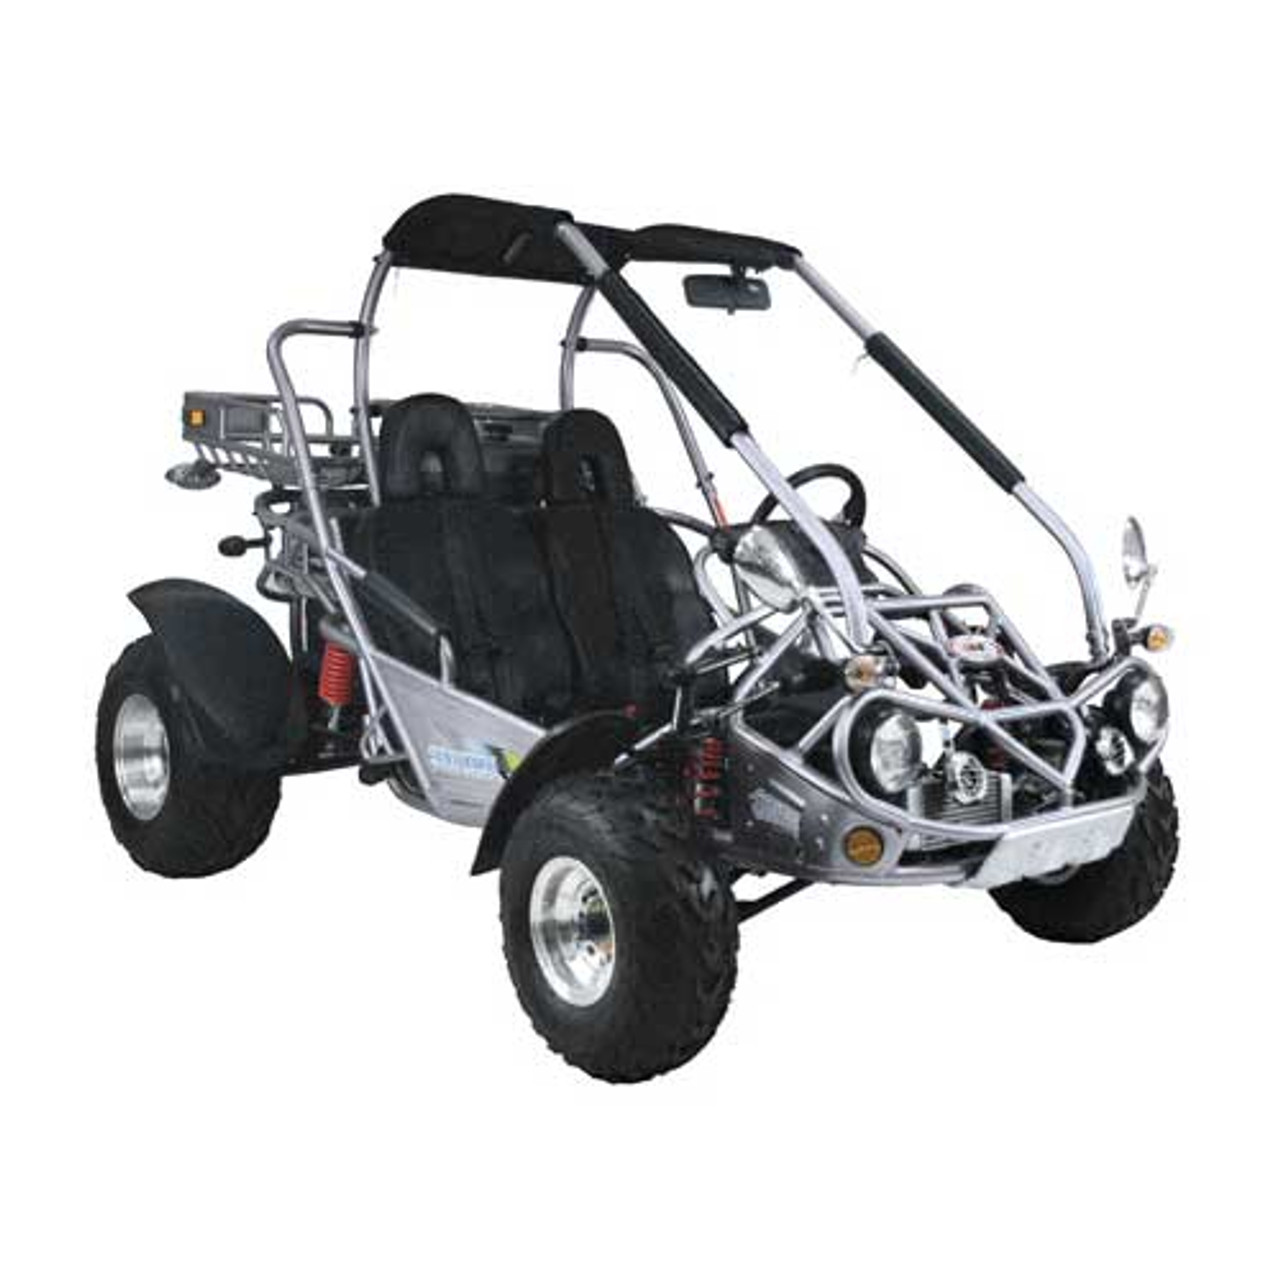 TrailMaster 300 XRX Go-Kart - Silver